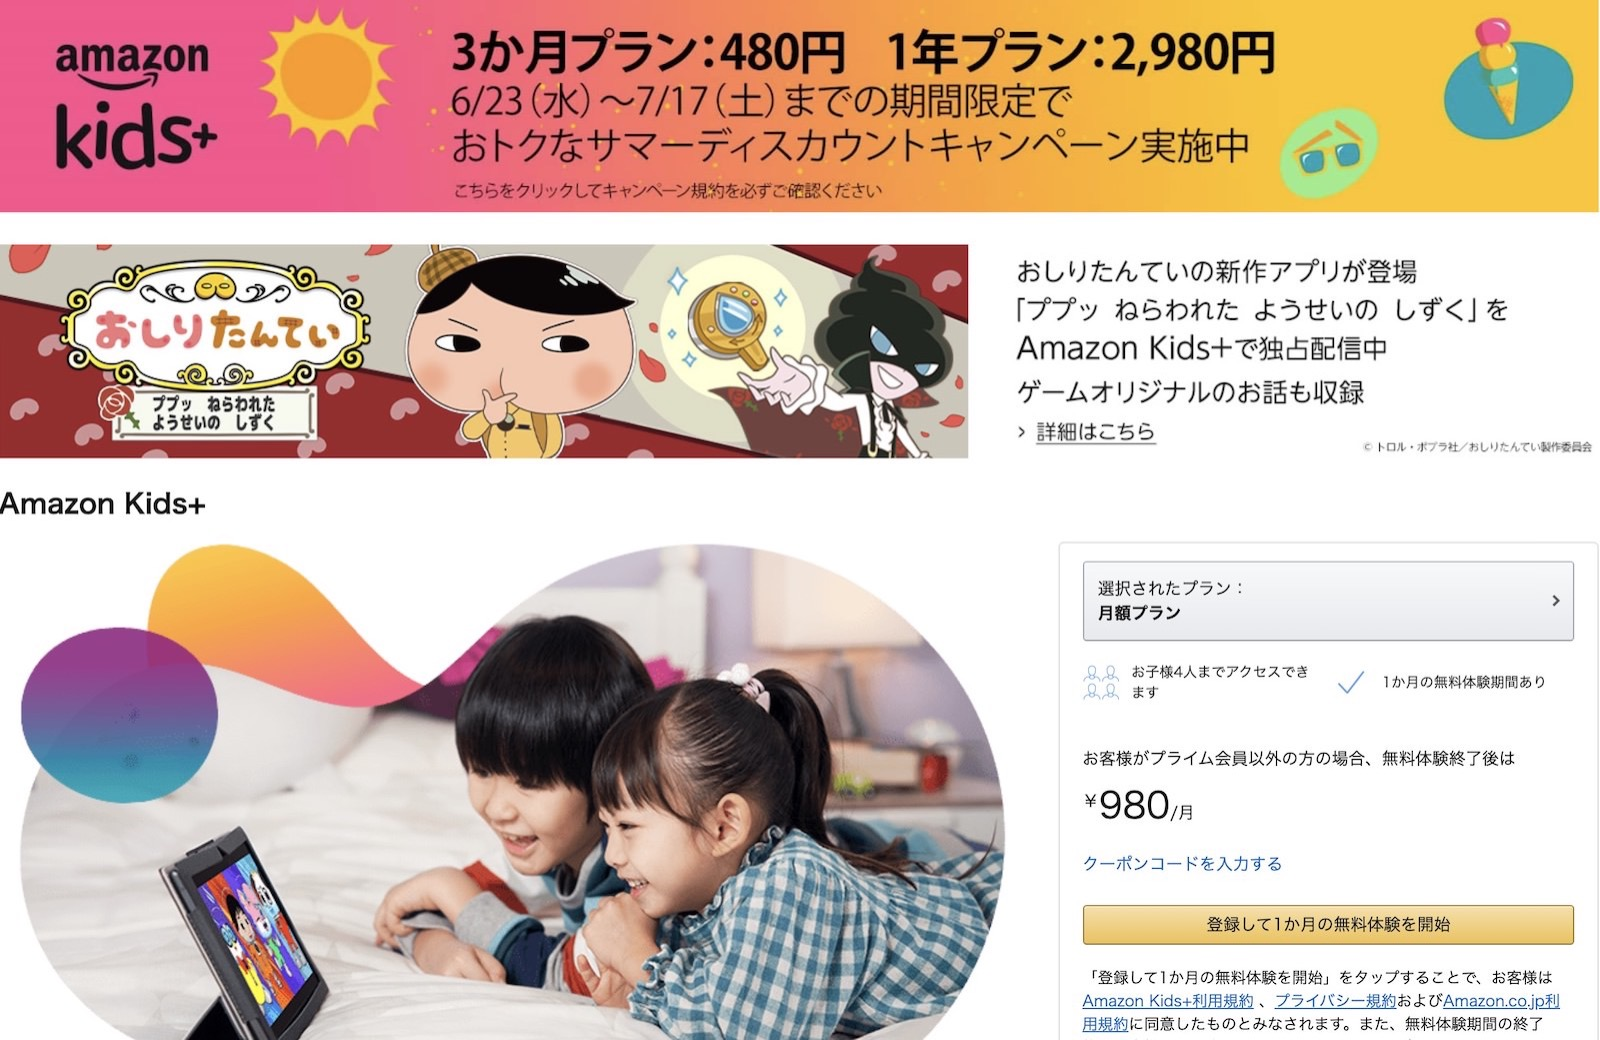 Amazon Kids Campaign summer discount